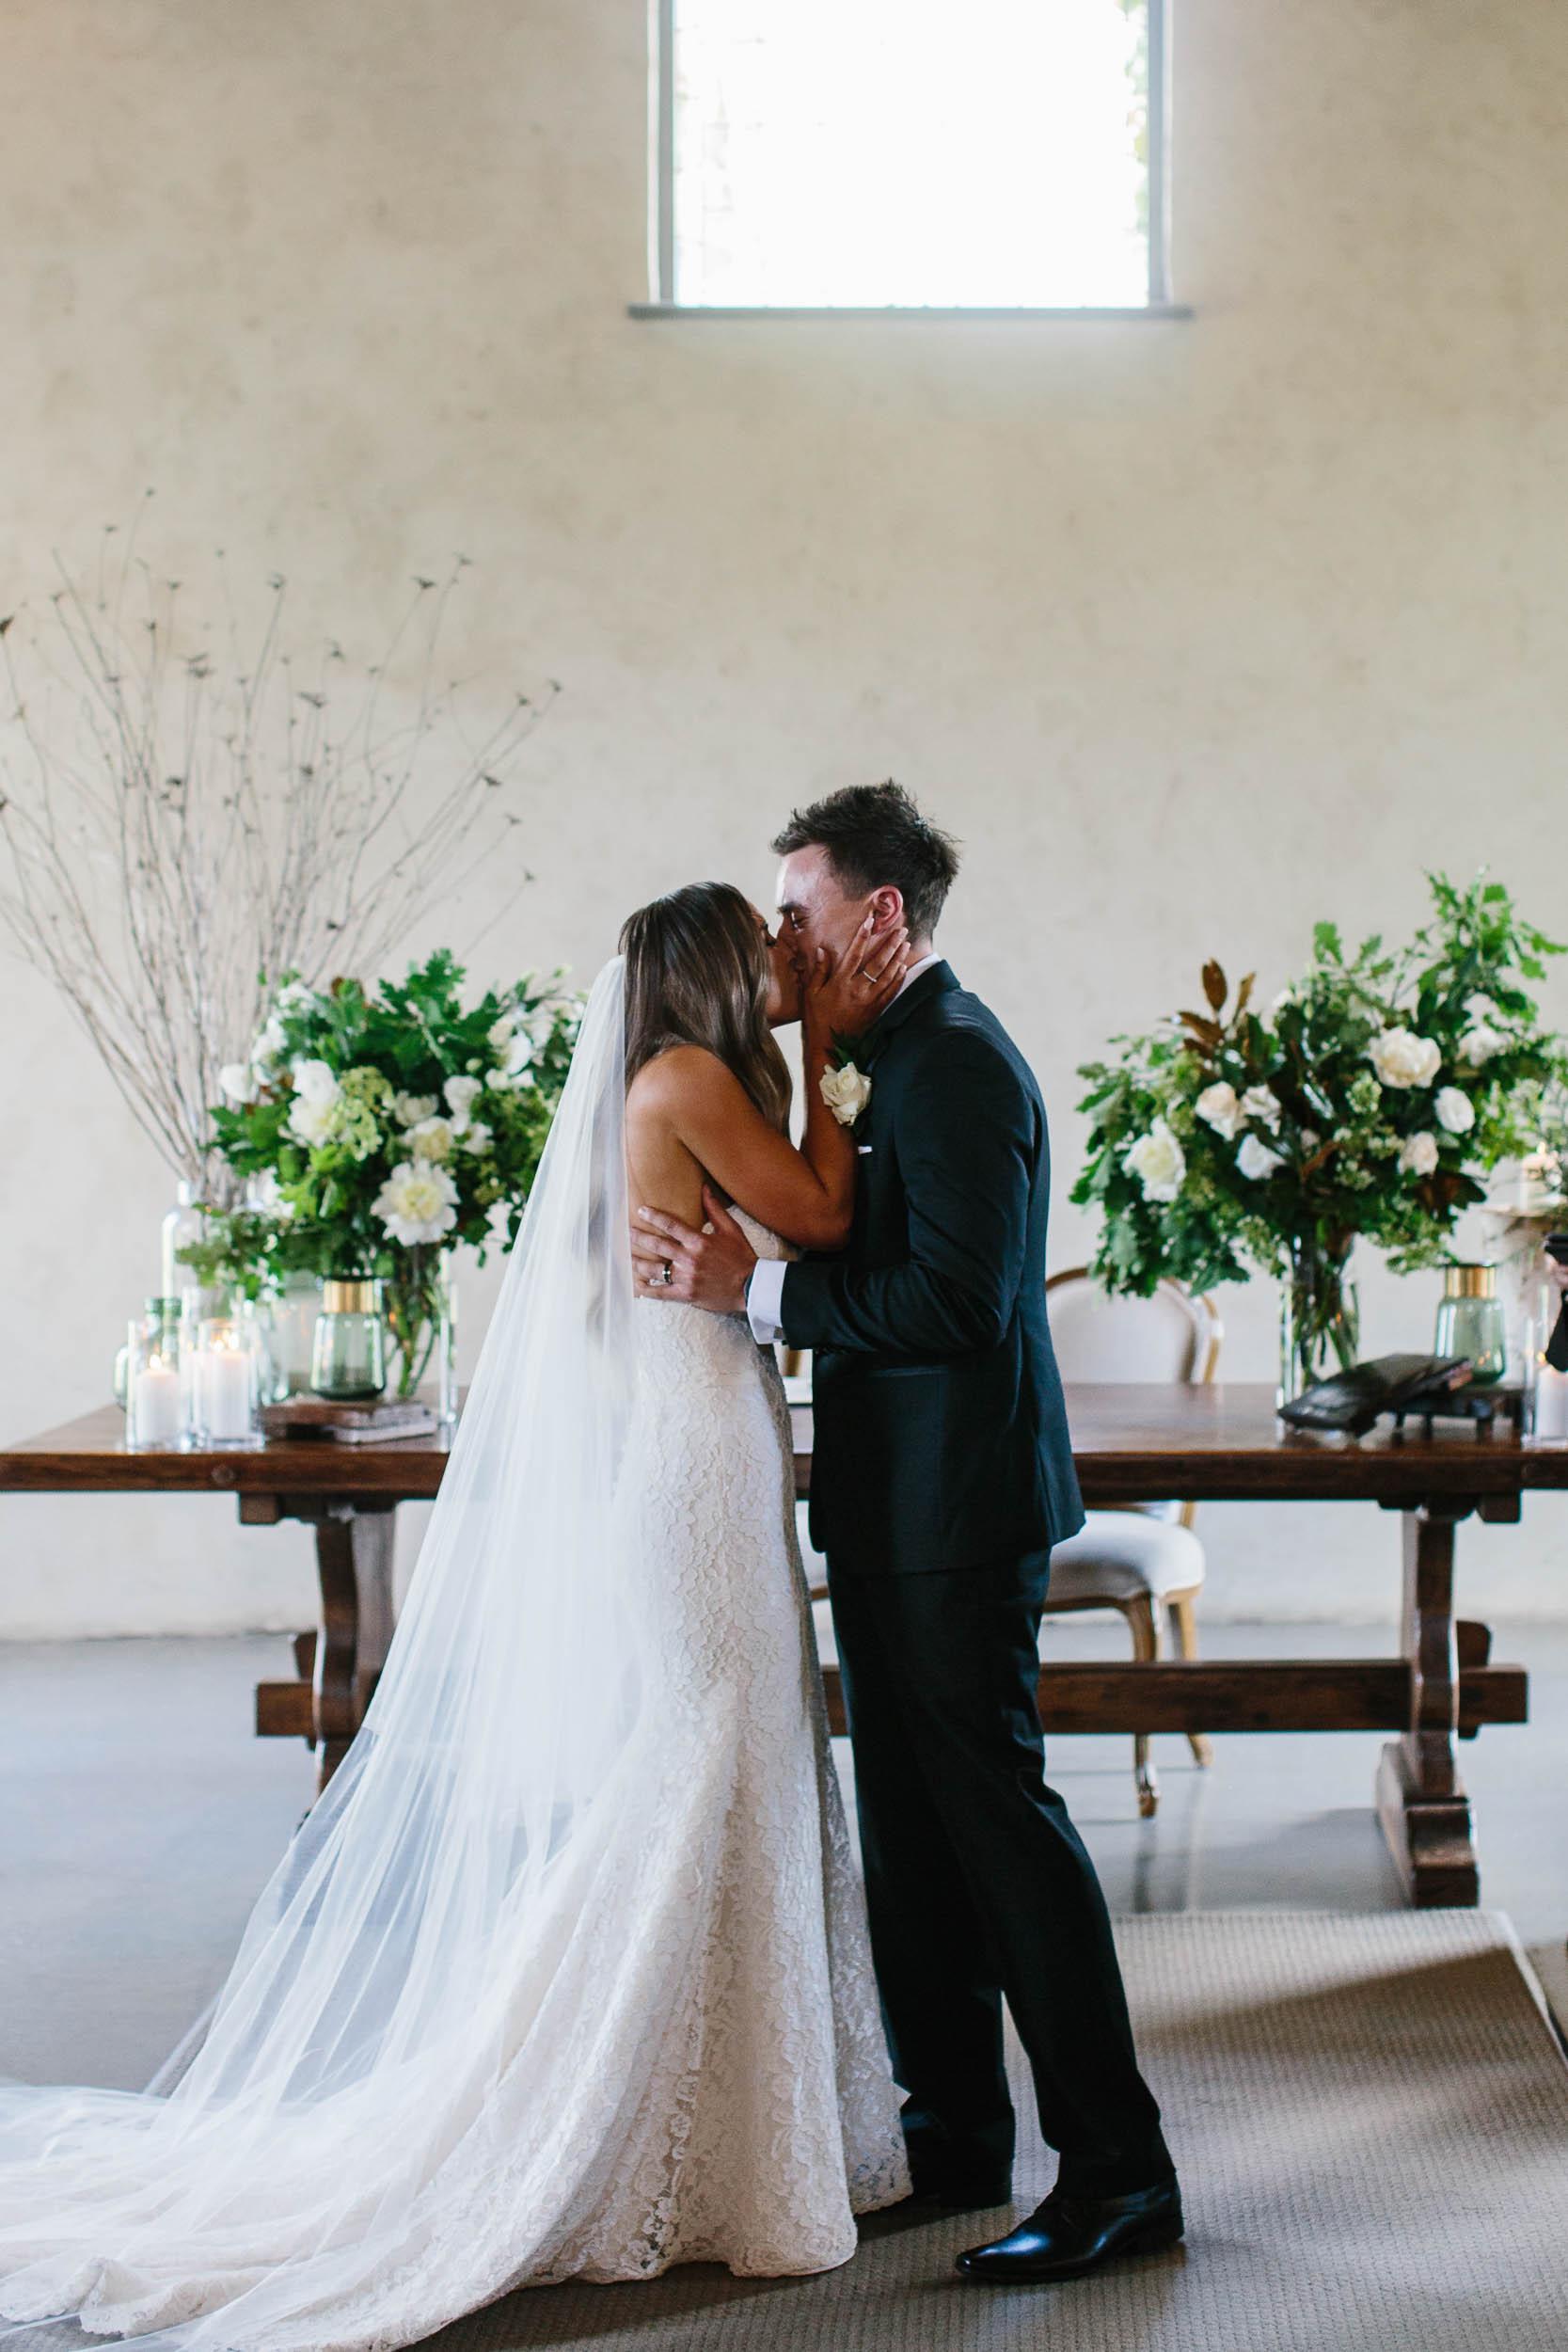 Kas-Richards-Stones-of-the-Yarra-Valley-Wedding-405.jpg